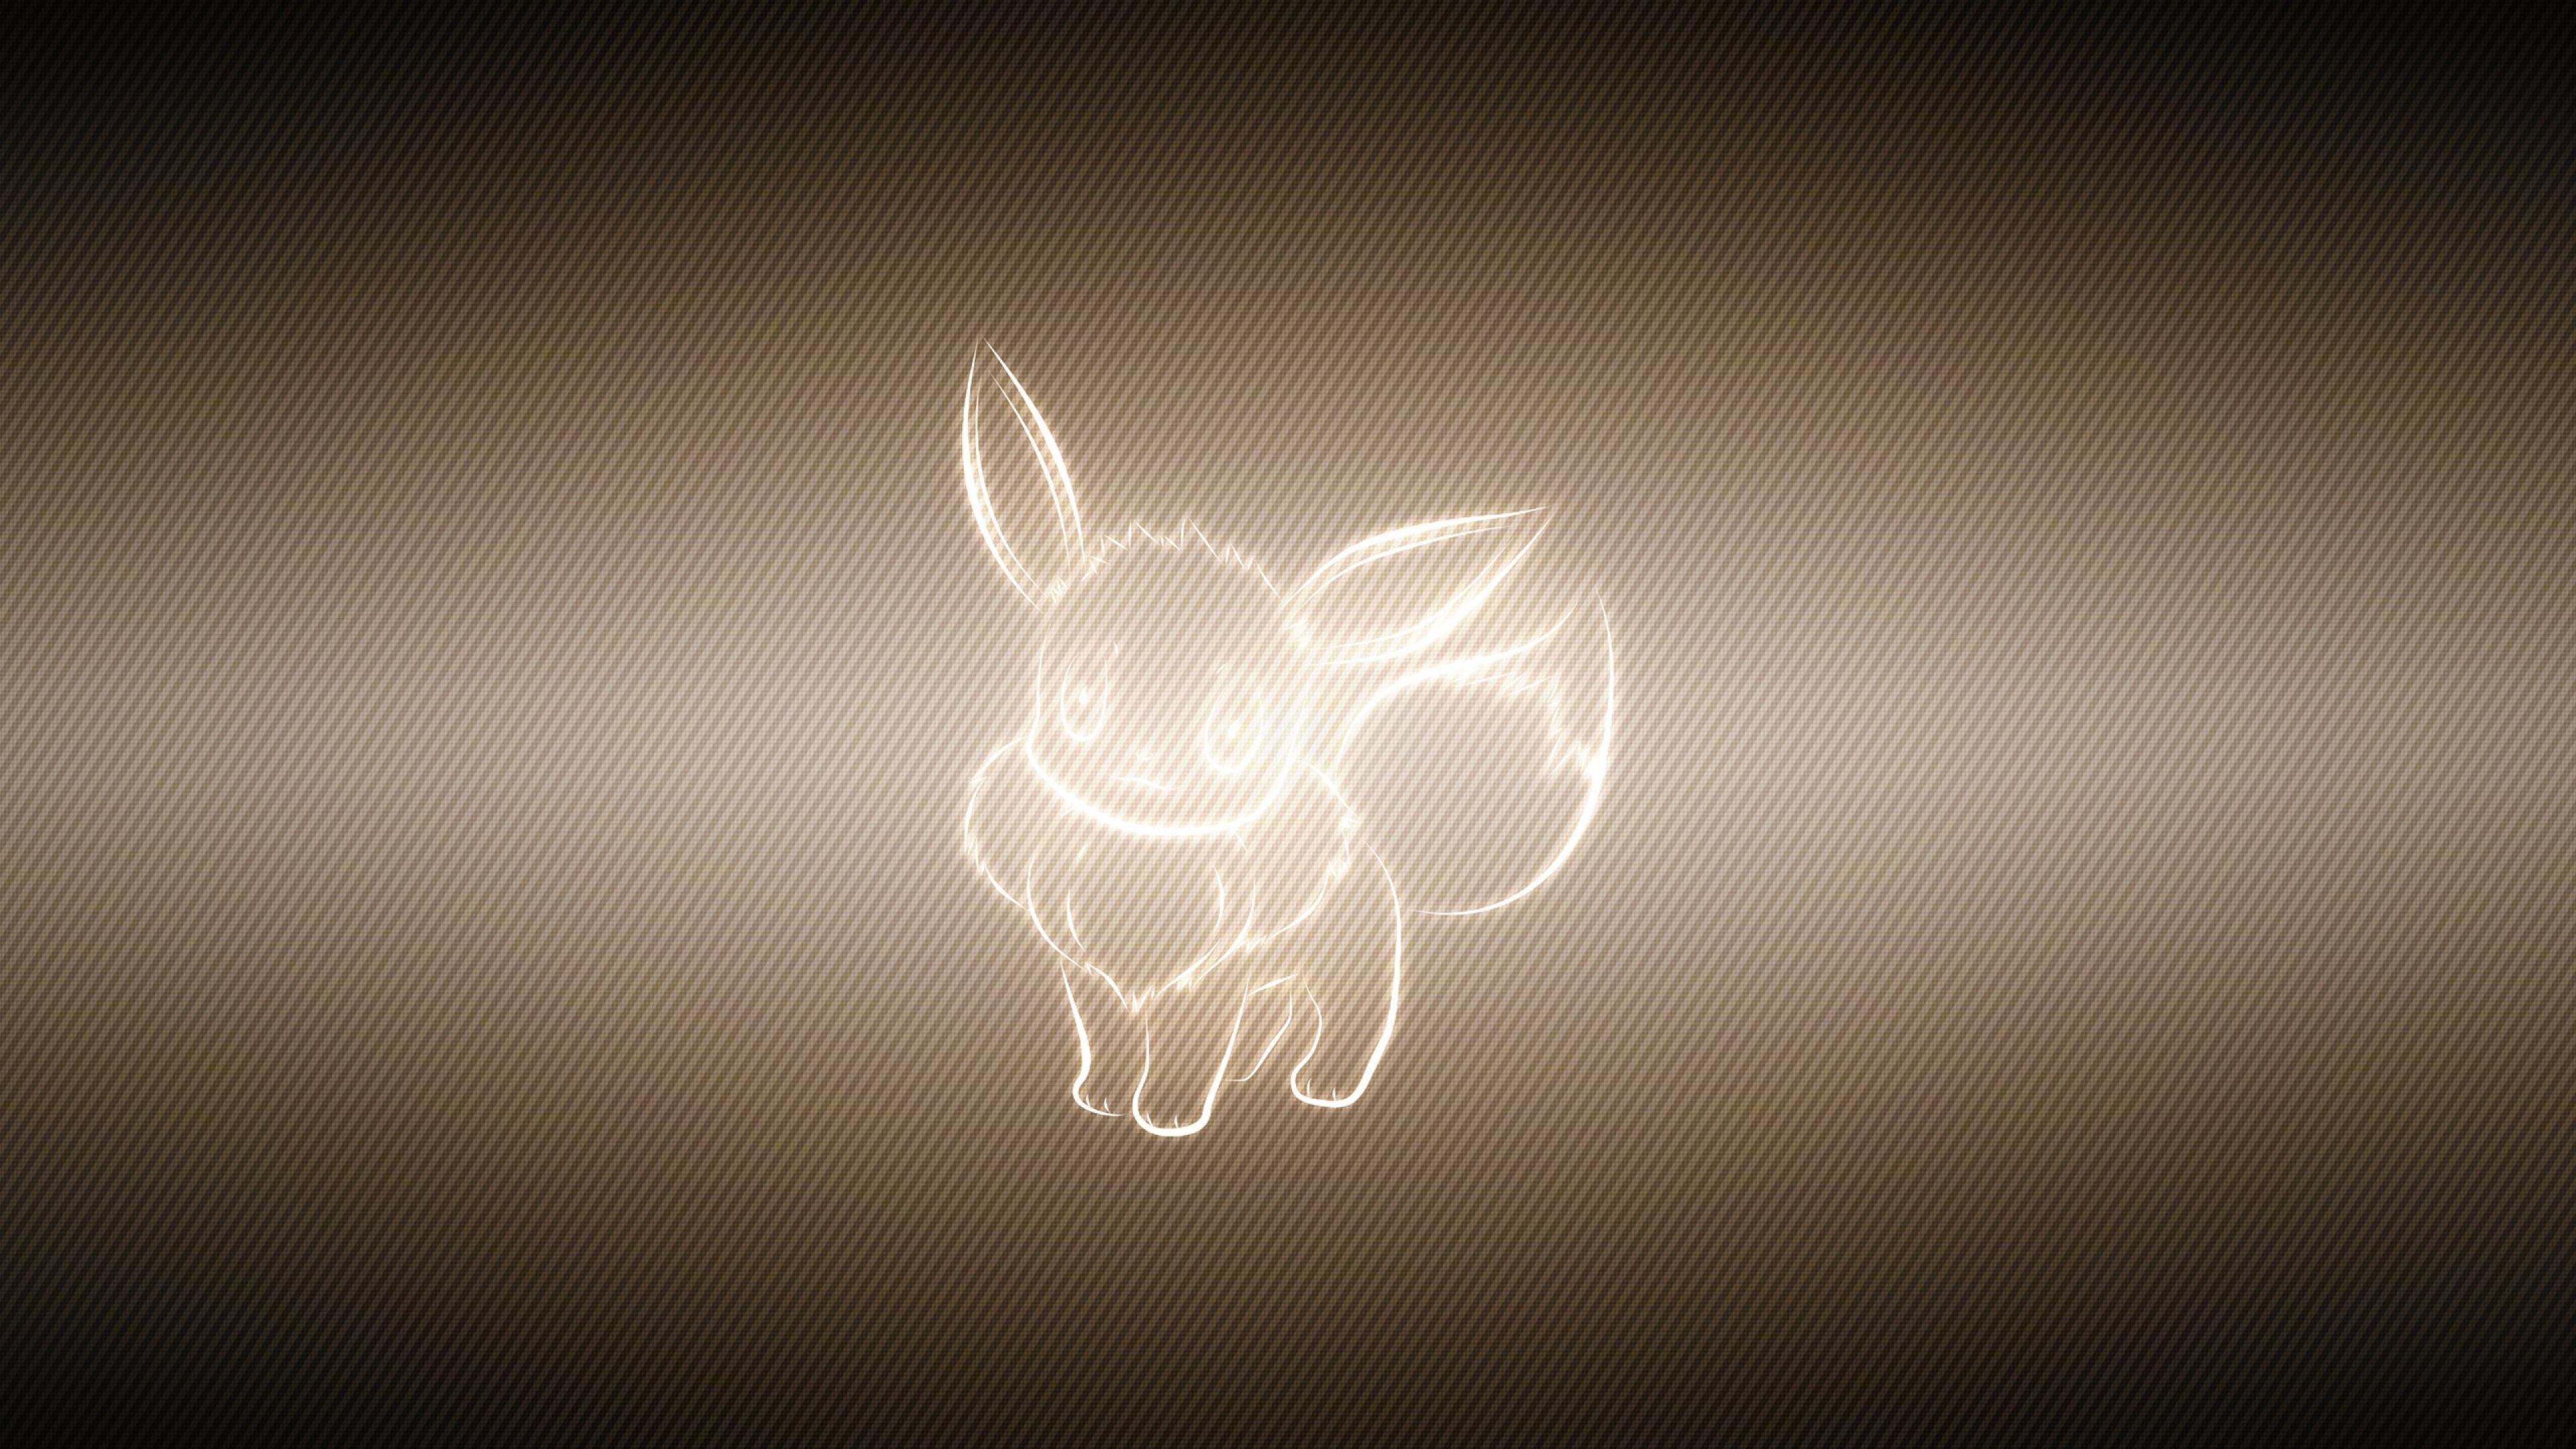 Download Wallpaper 3840x2160 animal pokemon eevee 4K Ultra HD HD 3840x2160